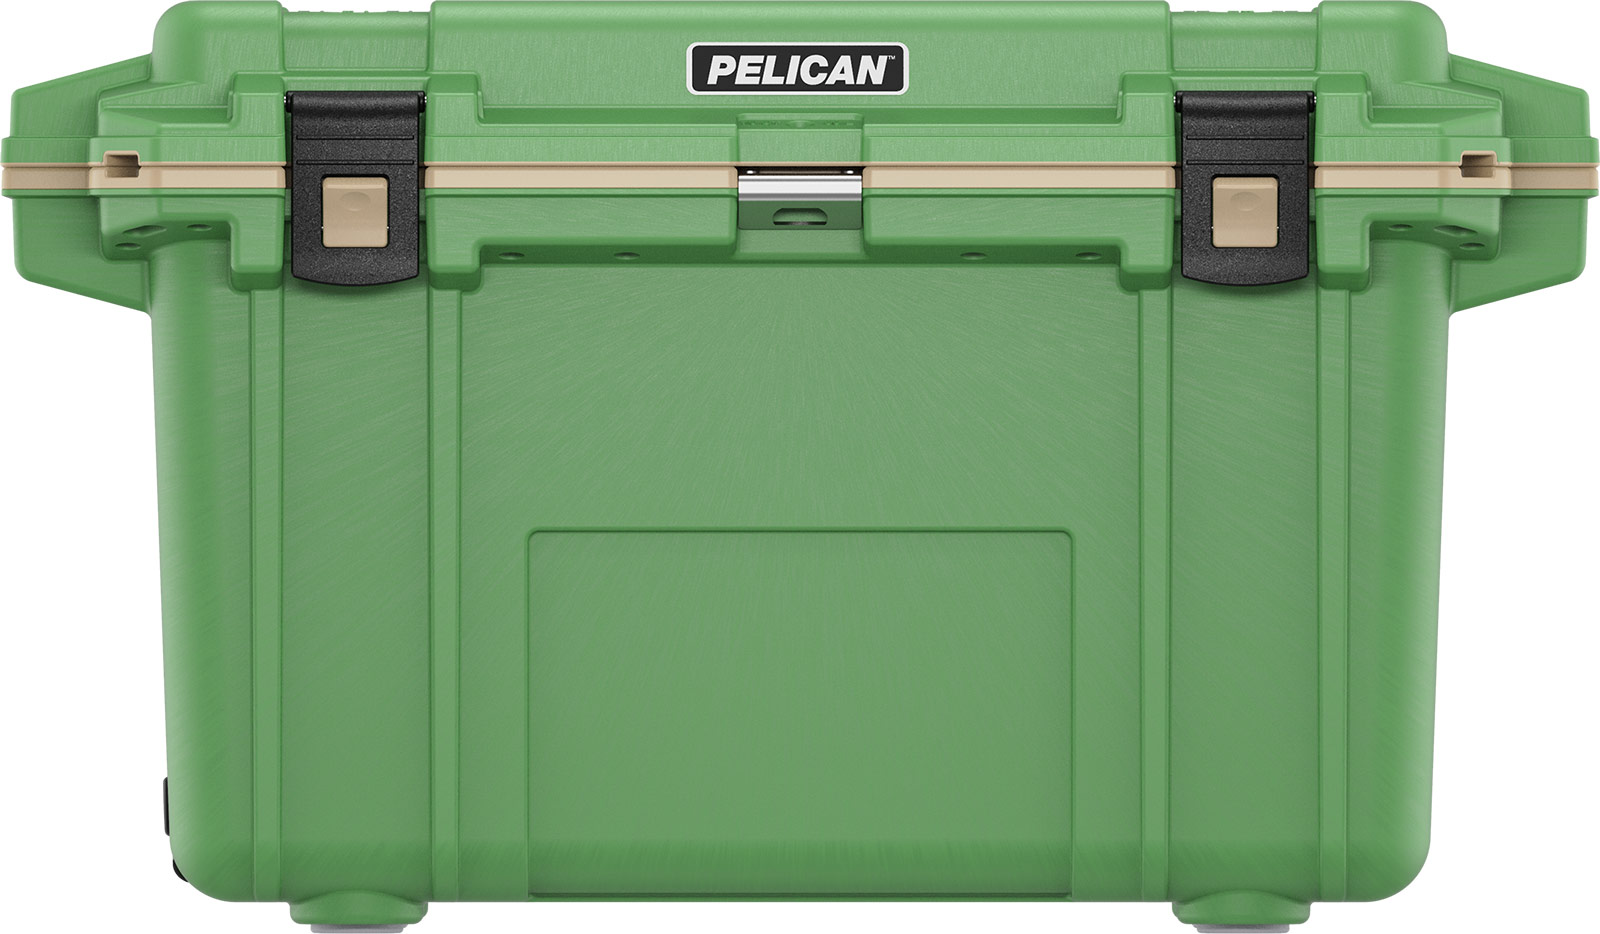 pelican 70qt overland coolers green cooler